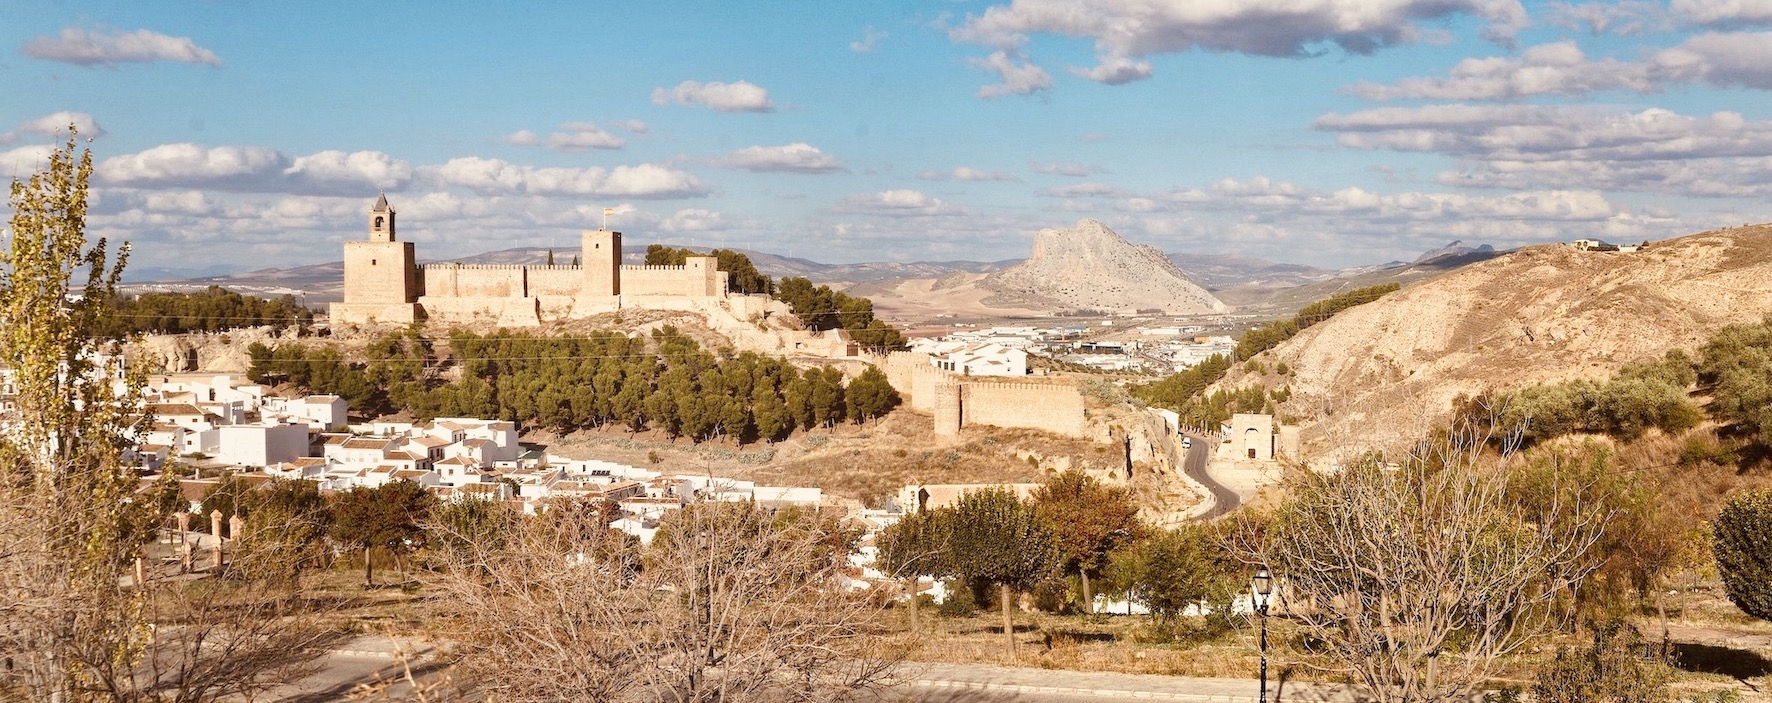 Antequera Alcazaba Andalusia.